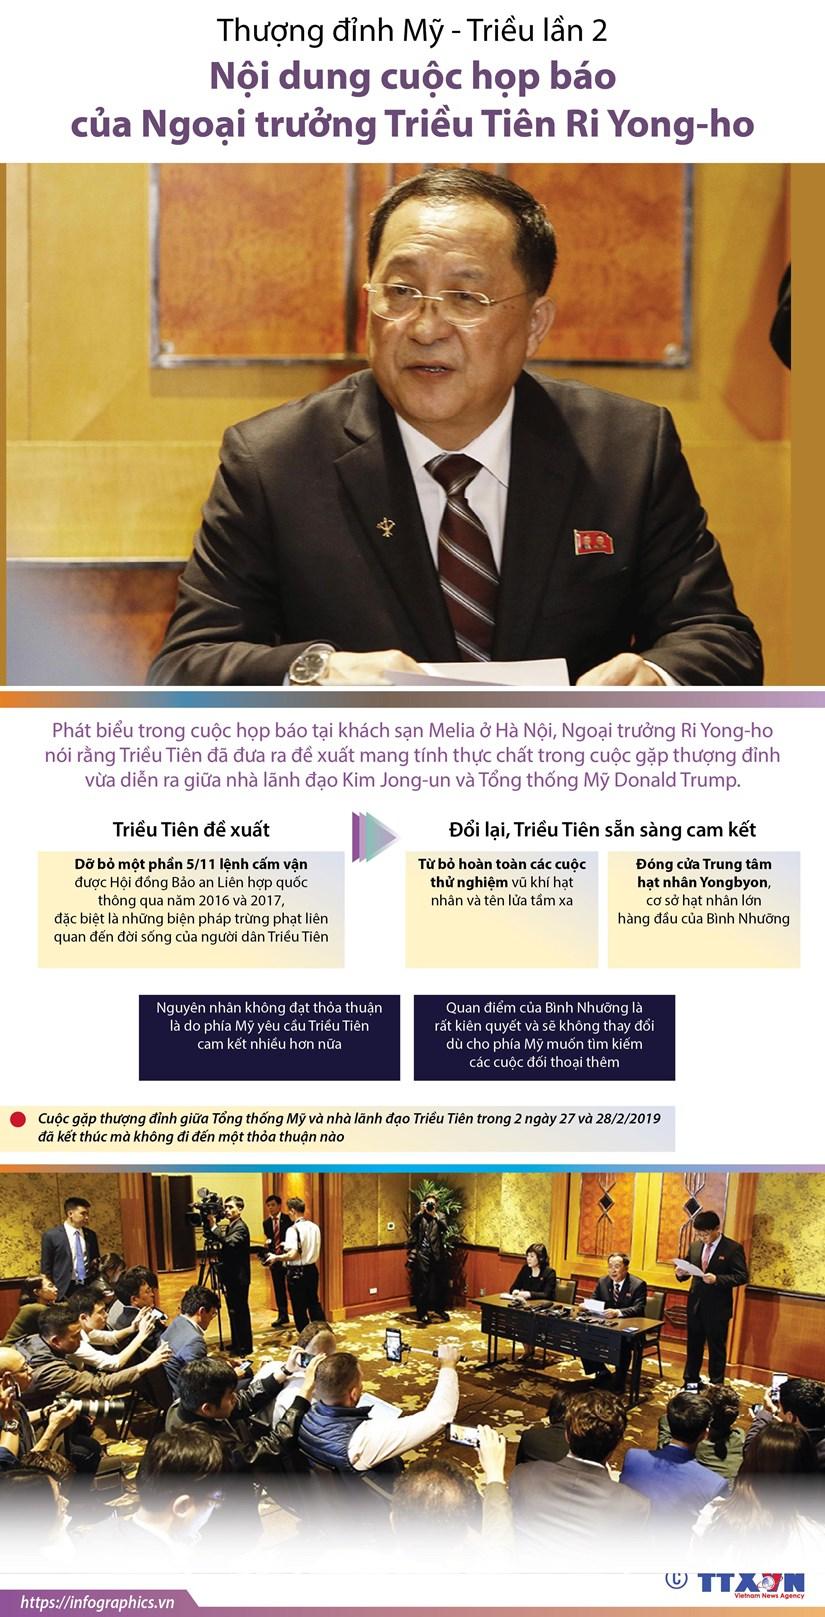 [Infographics] Noi dung hop bao cua Ngoai truong Trieu Tien Ri Yong-ho hinh anh 1